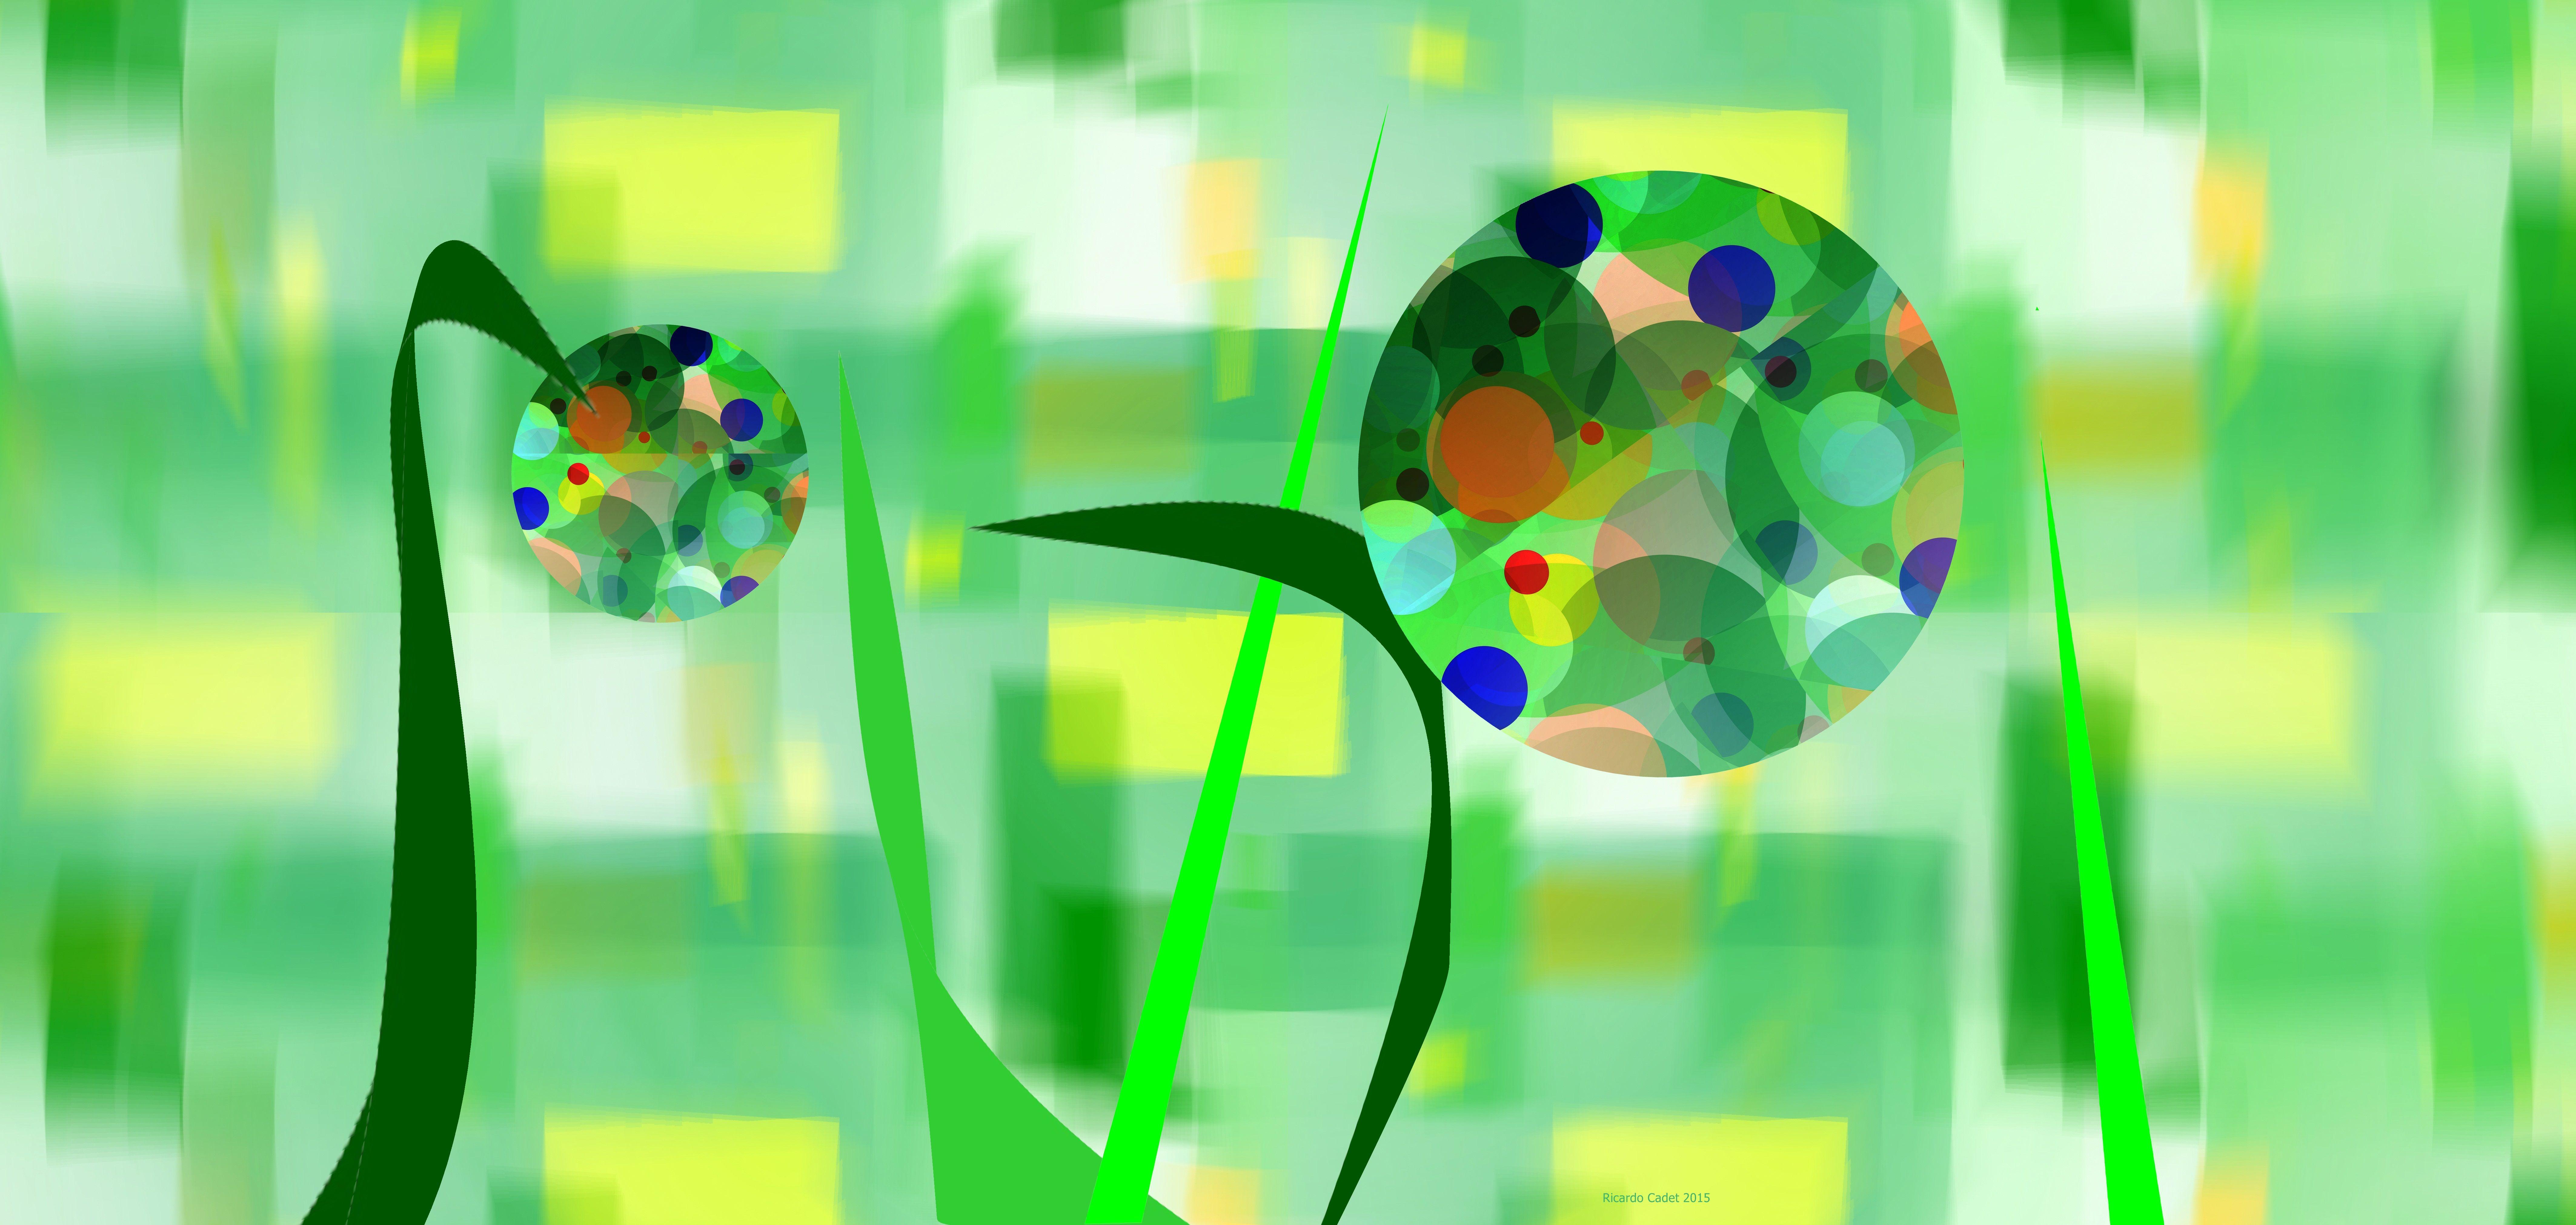 Naturaleza viva #arte #artecontemporáneo #diseño #desing #art #ilustracion #artedigital #ilustration #RicardoCadet #hechoenVenezuela #madeinVenezuela